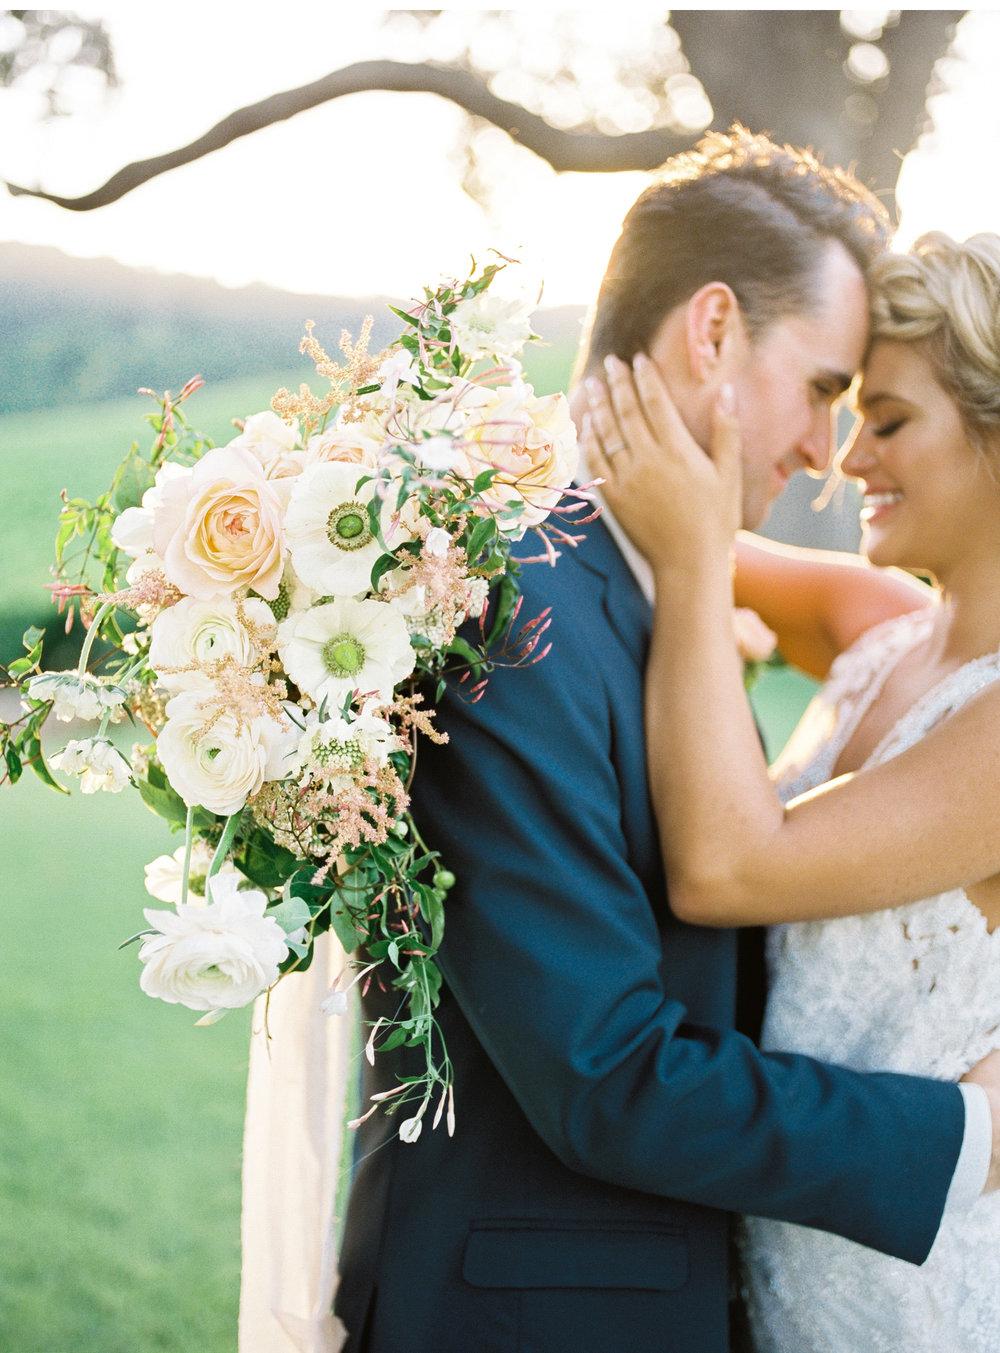 Malibu-Weddings-Natalie-Schutt-Photography_09.jpg